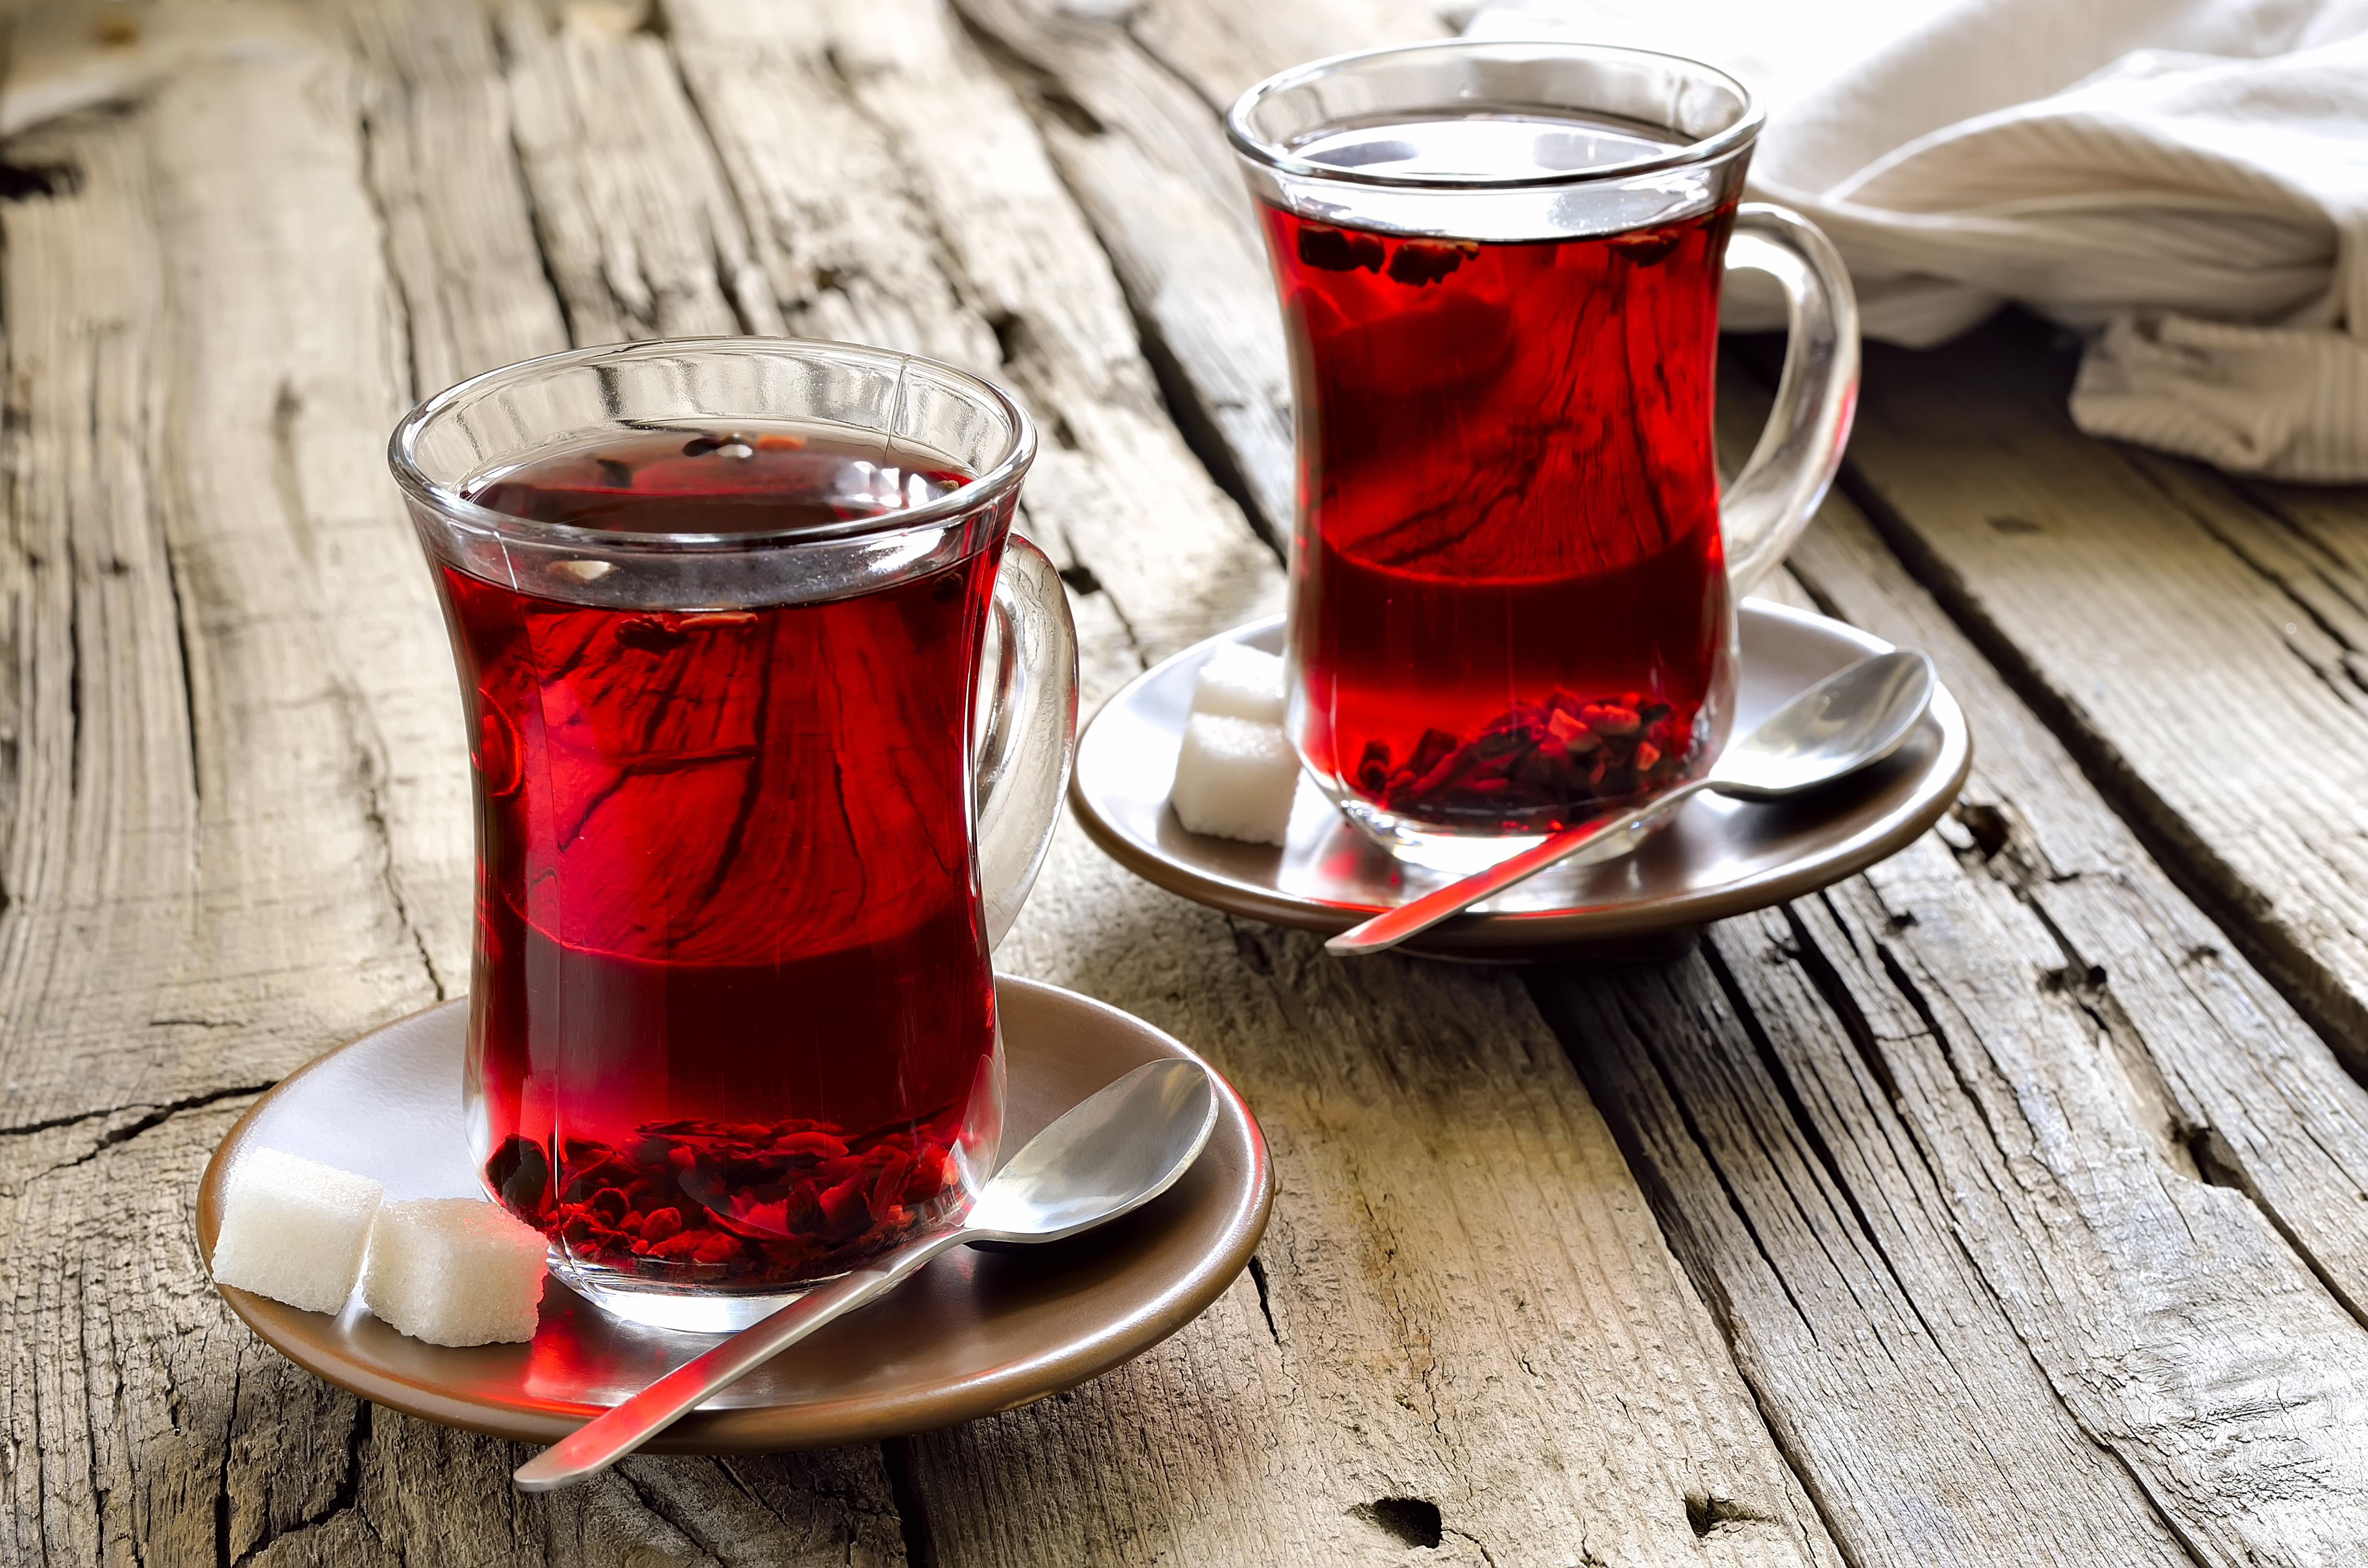 Турецкий чай в чашках